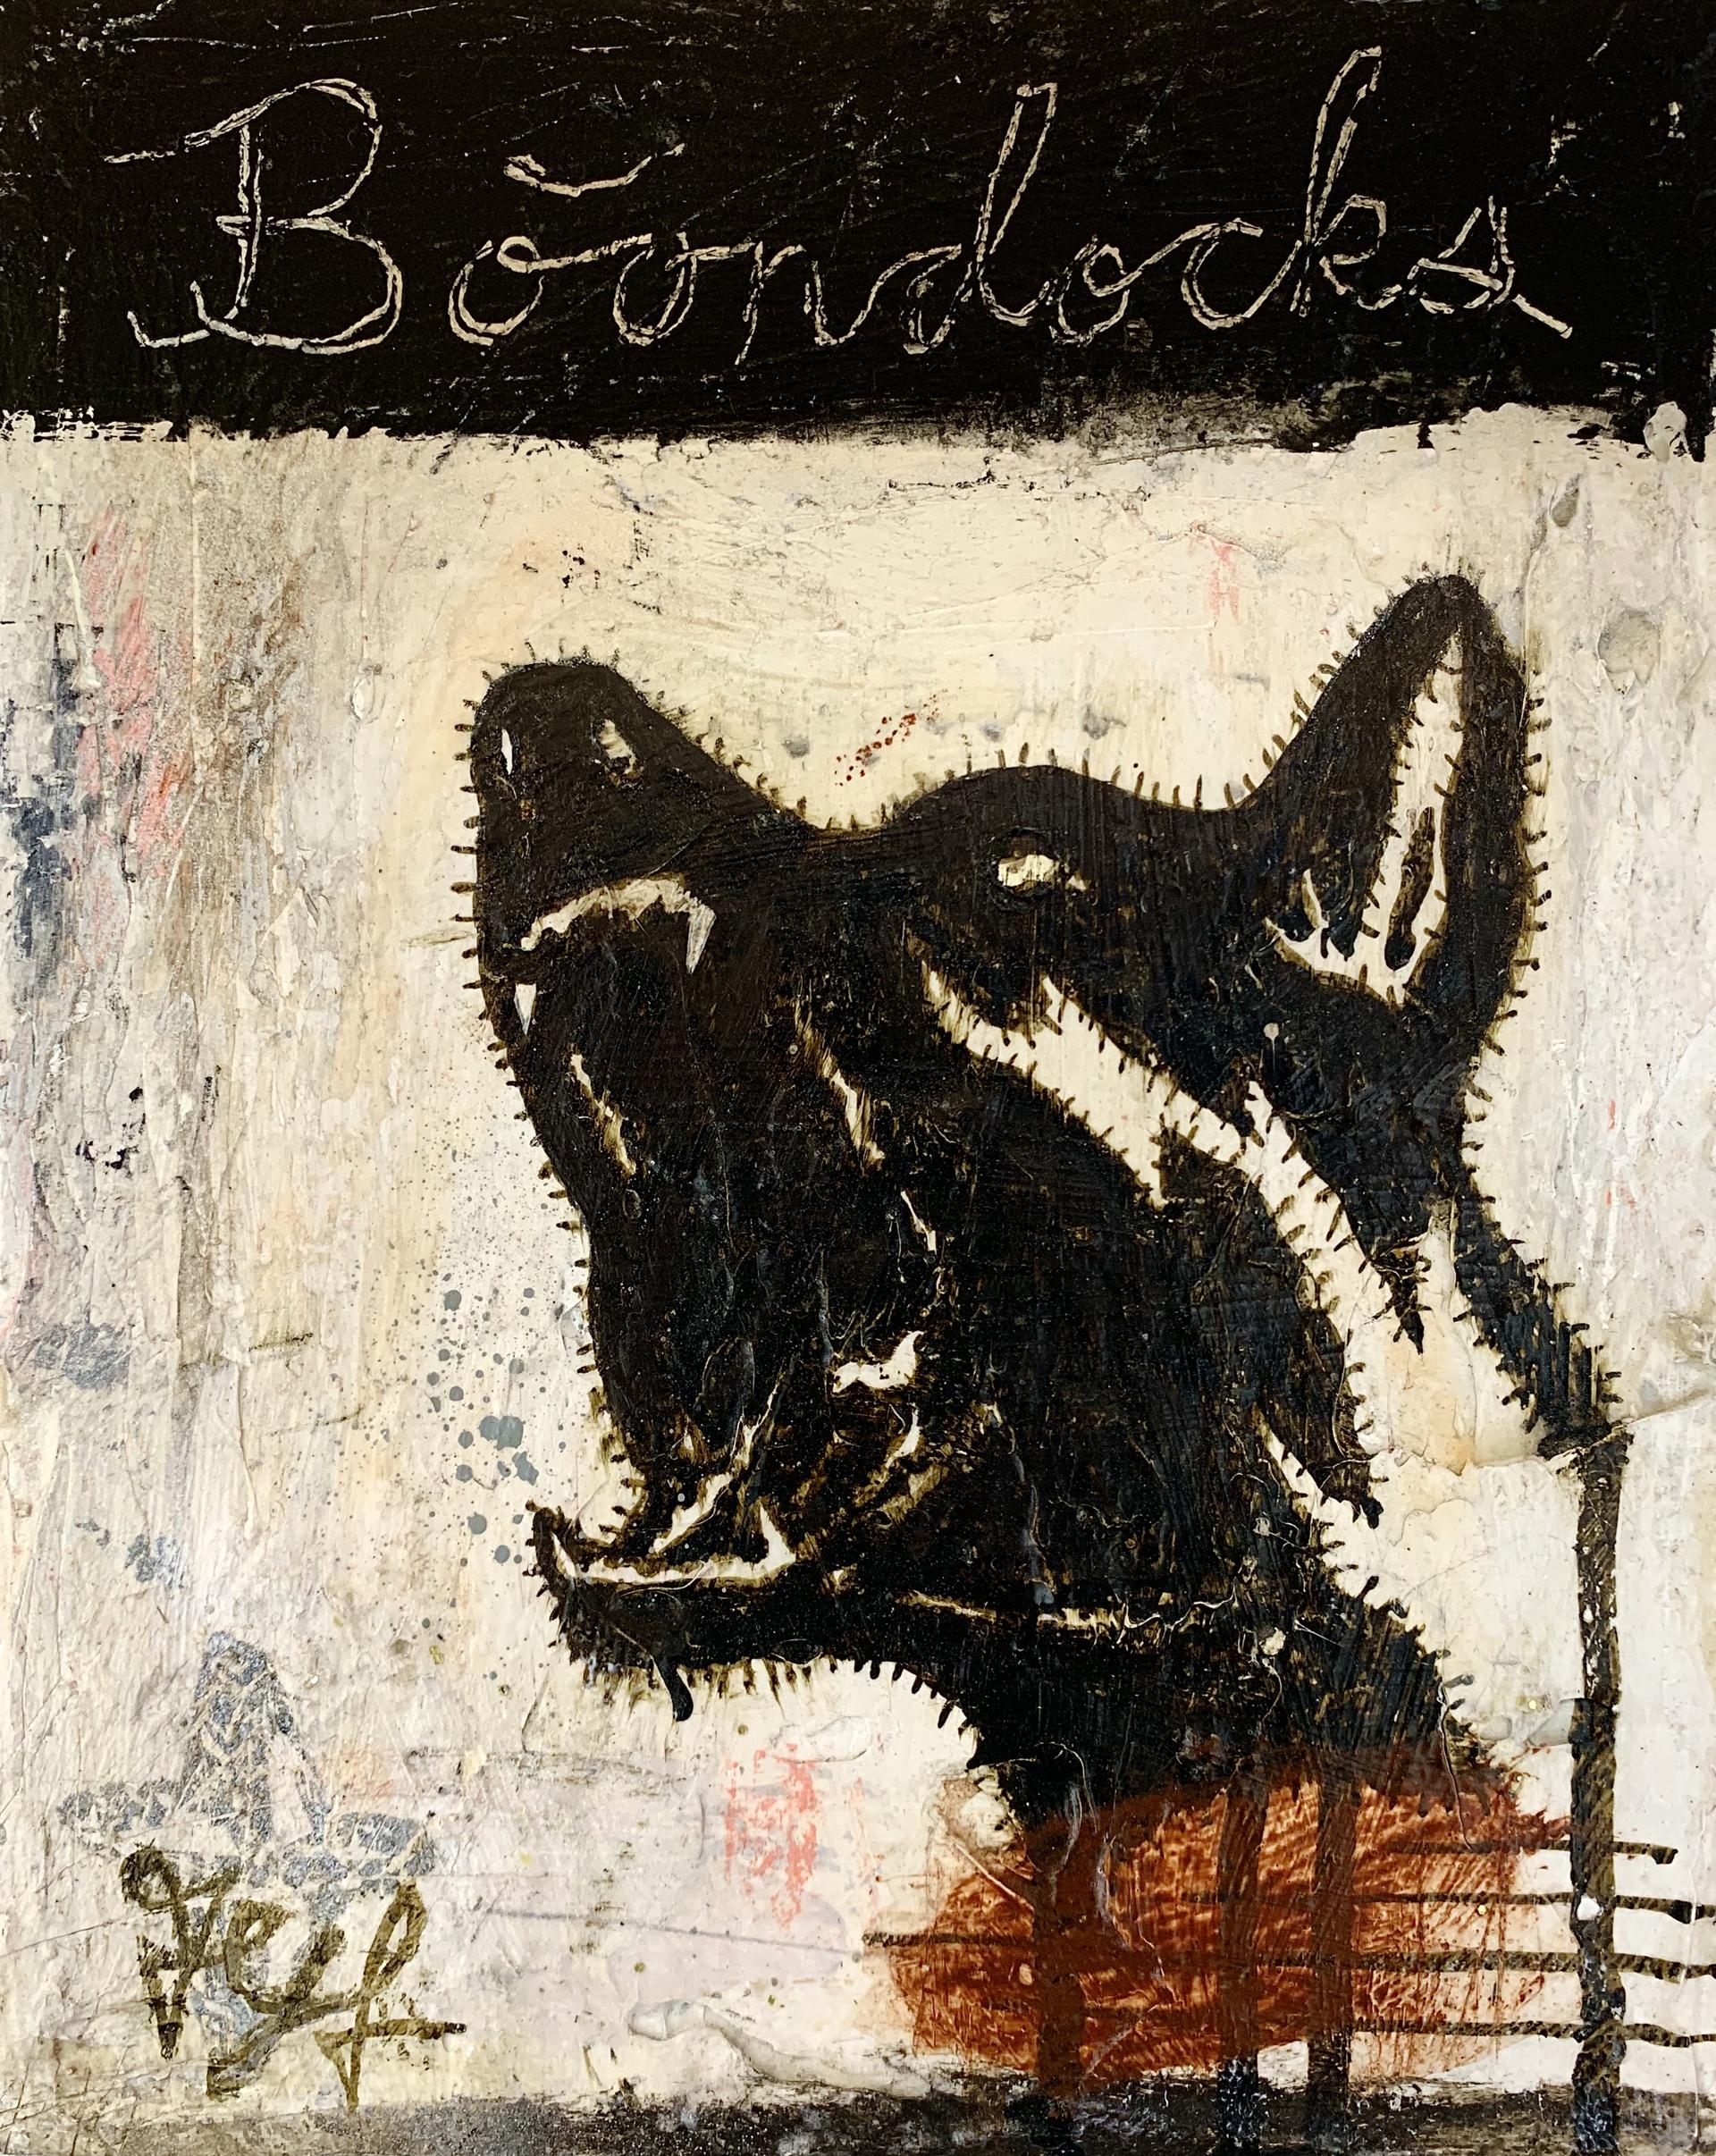 BOONDOCKS by John Yoyogi Fortes